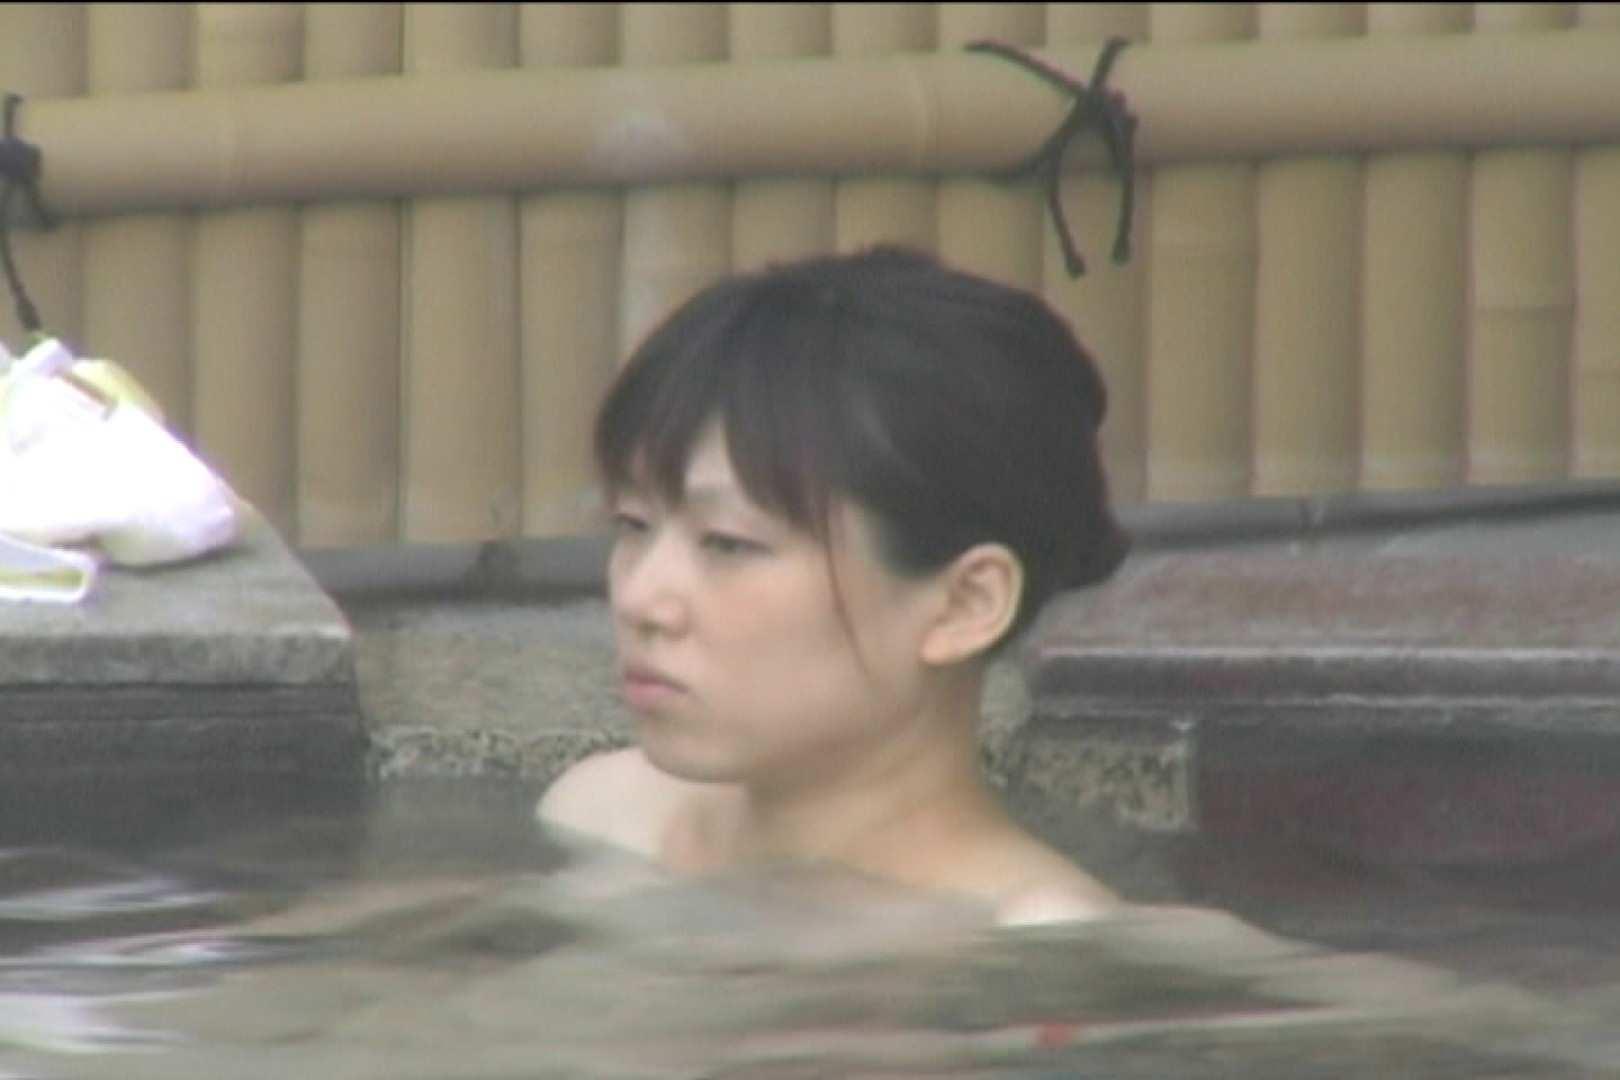 Aquaな露天風呂Vol.121 盗撮映像  23Pix 11